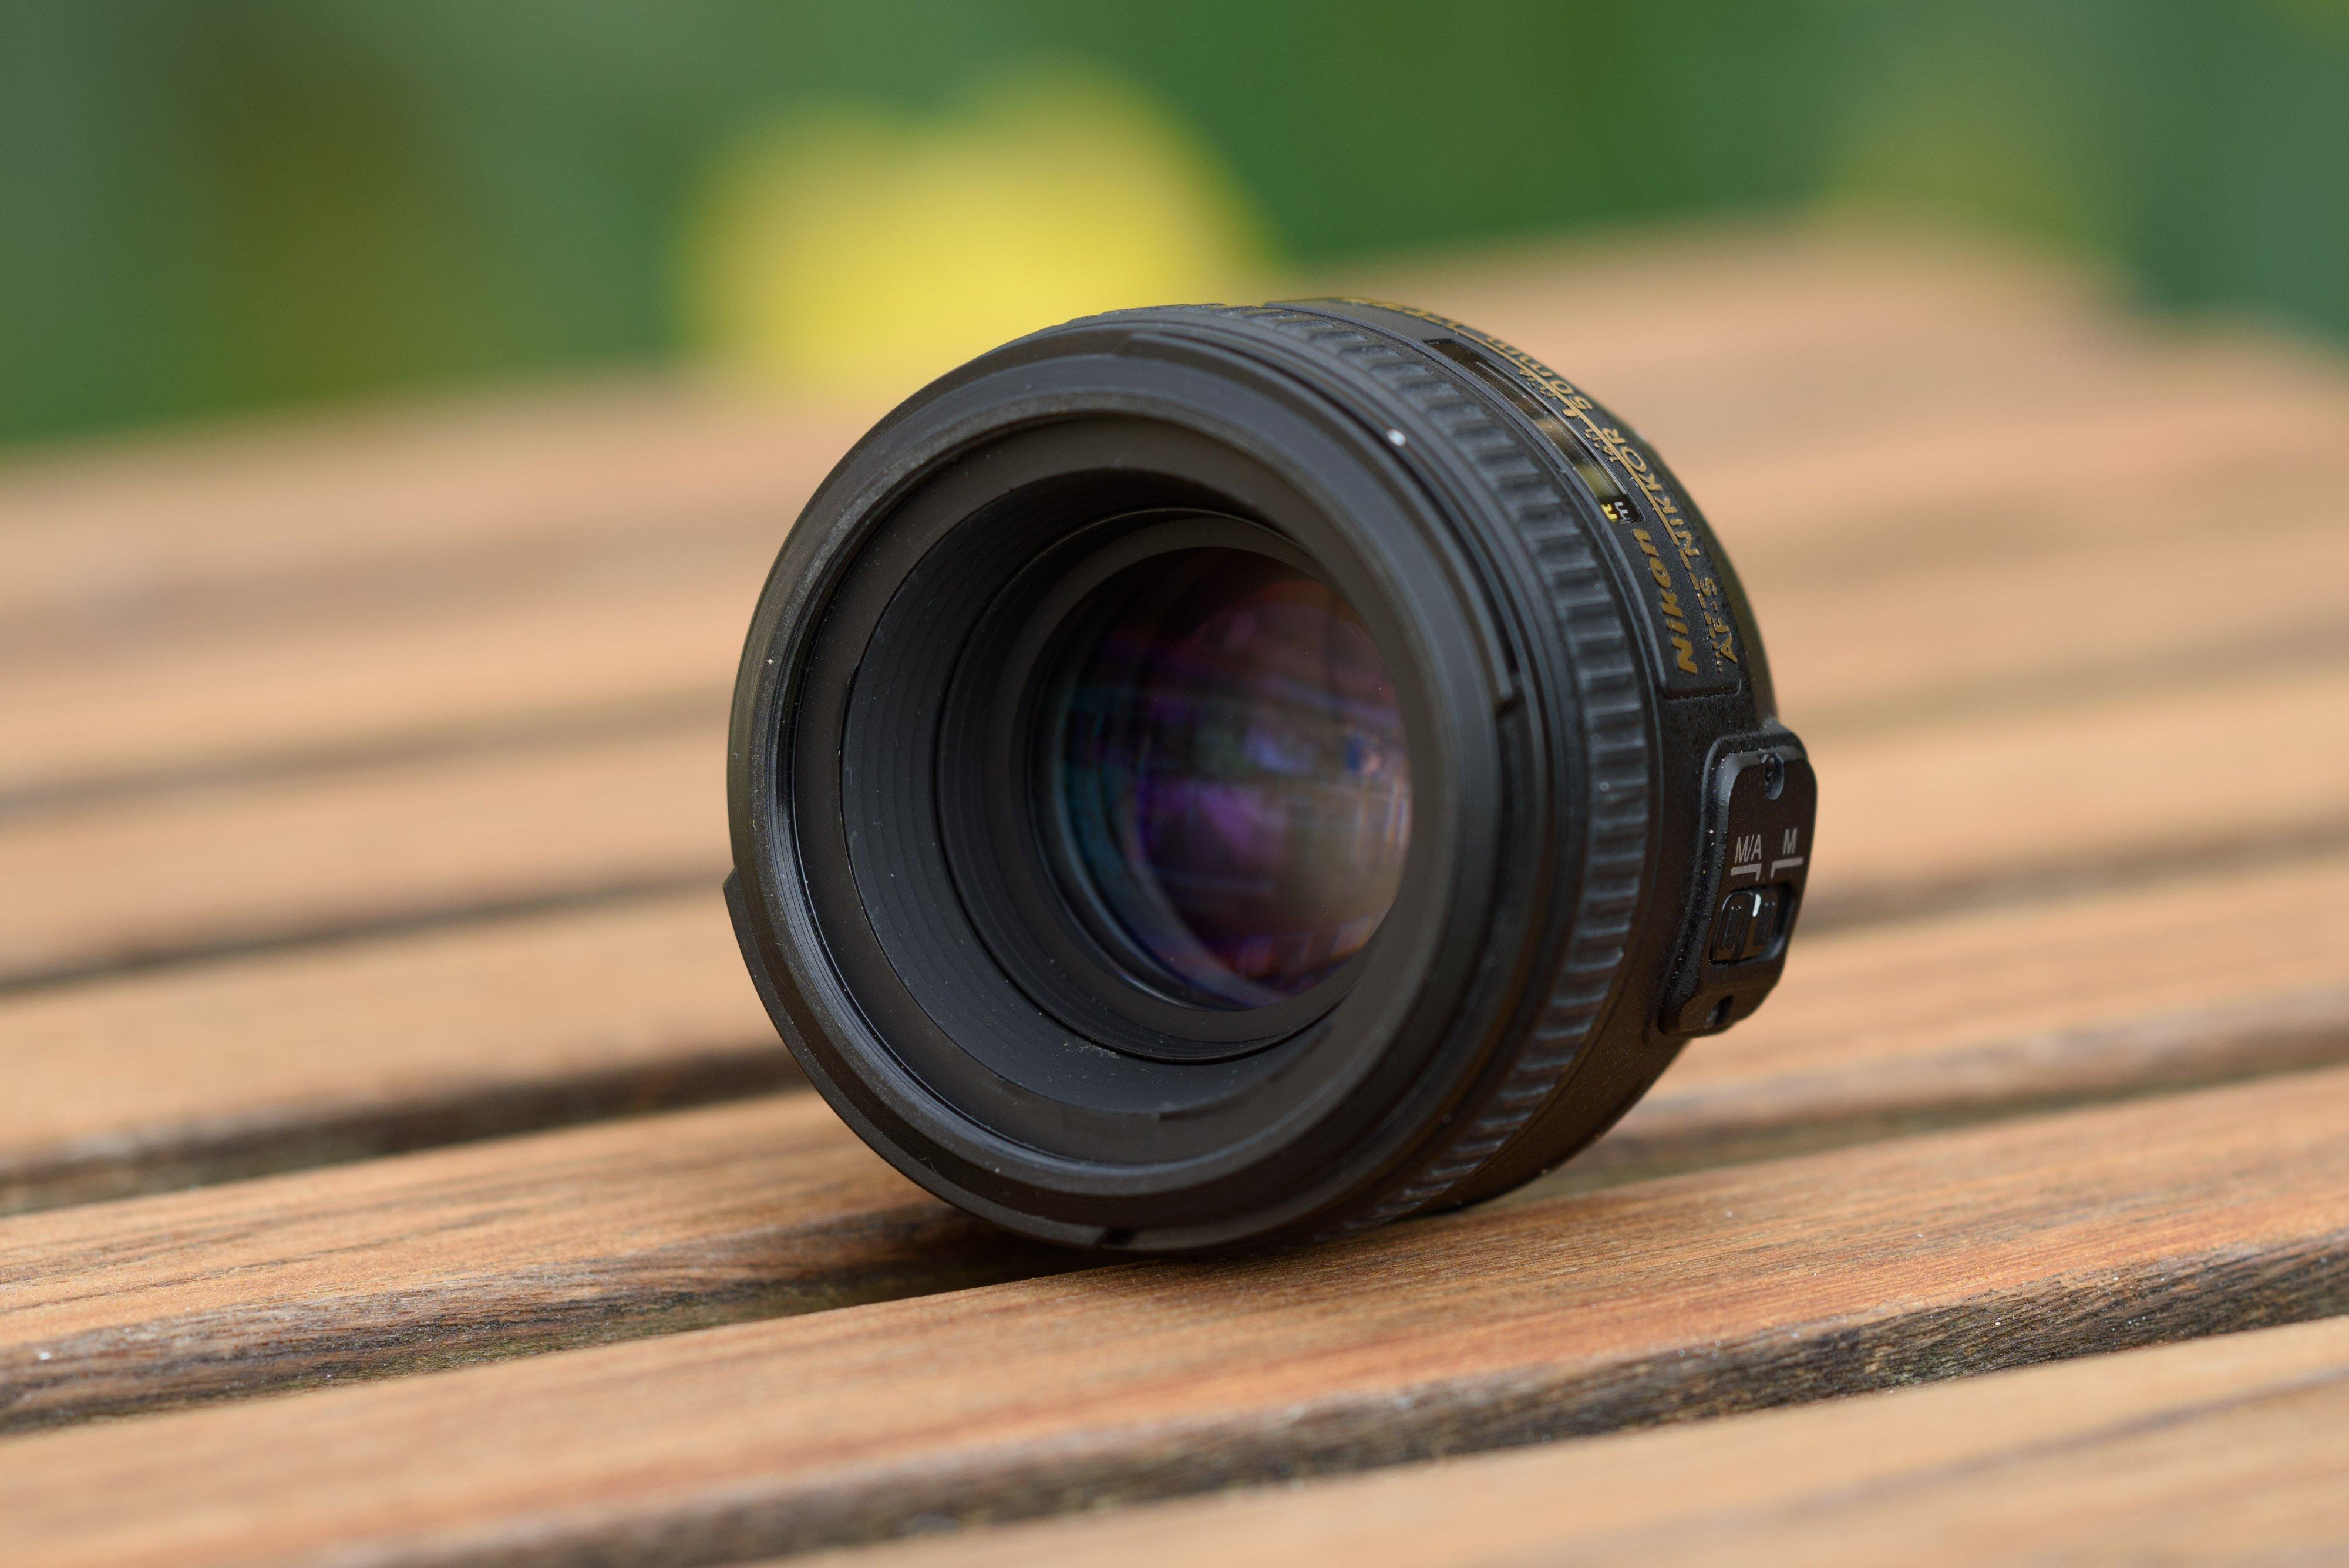 Nikon 50mm f1.4G review